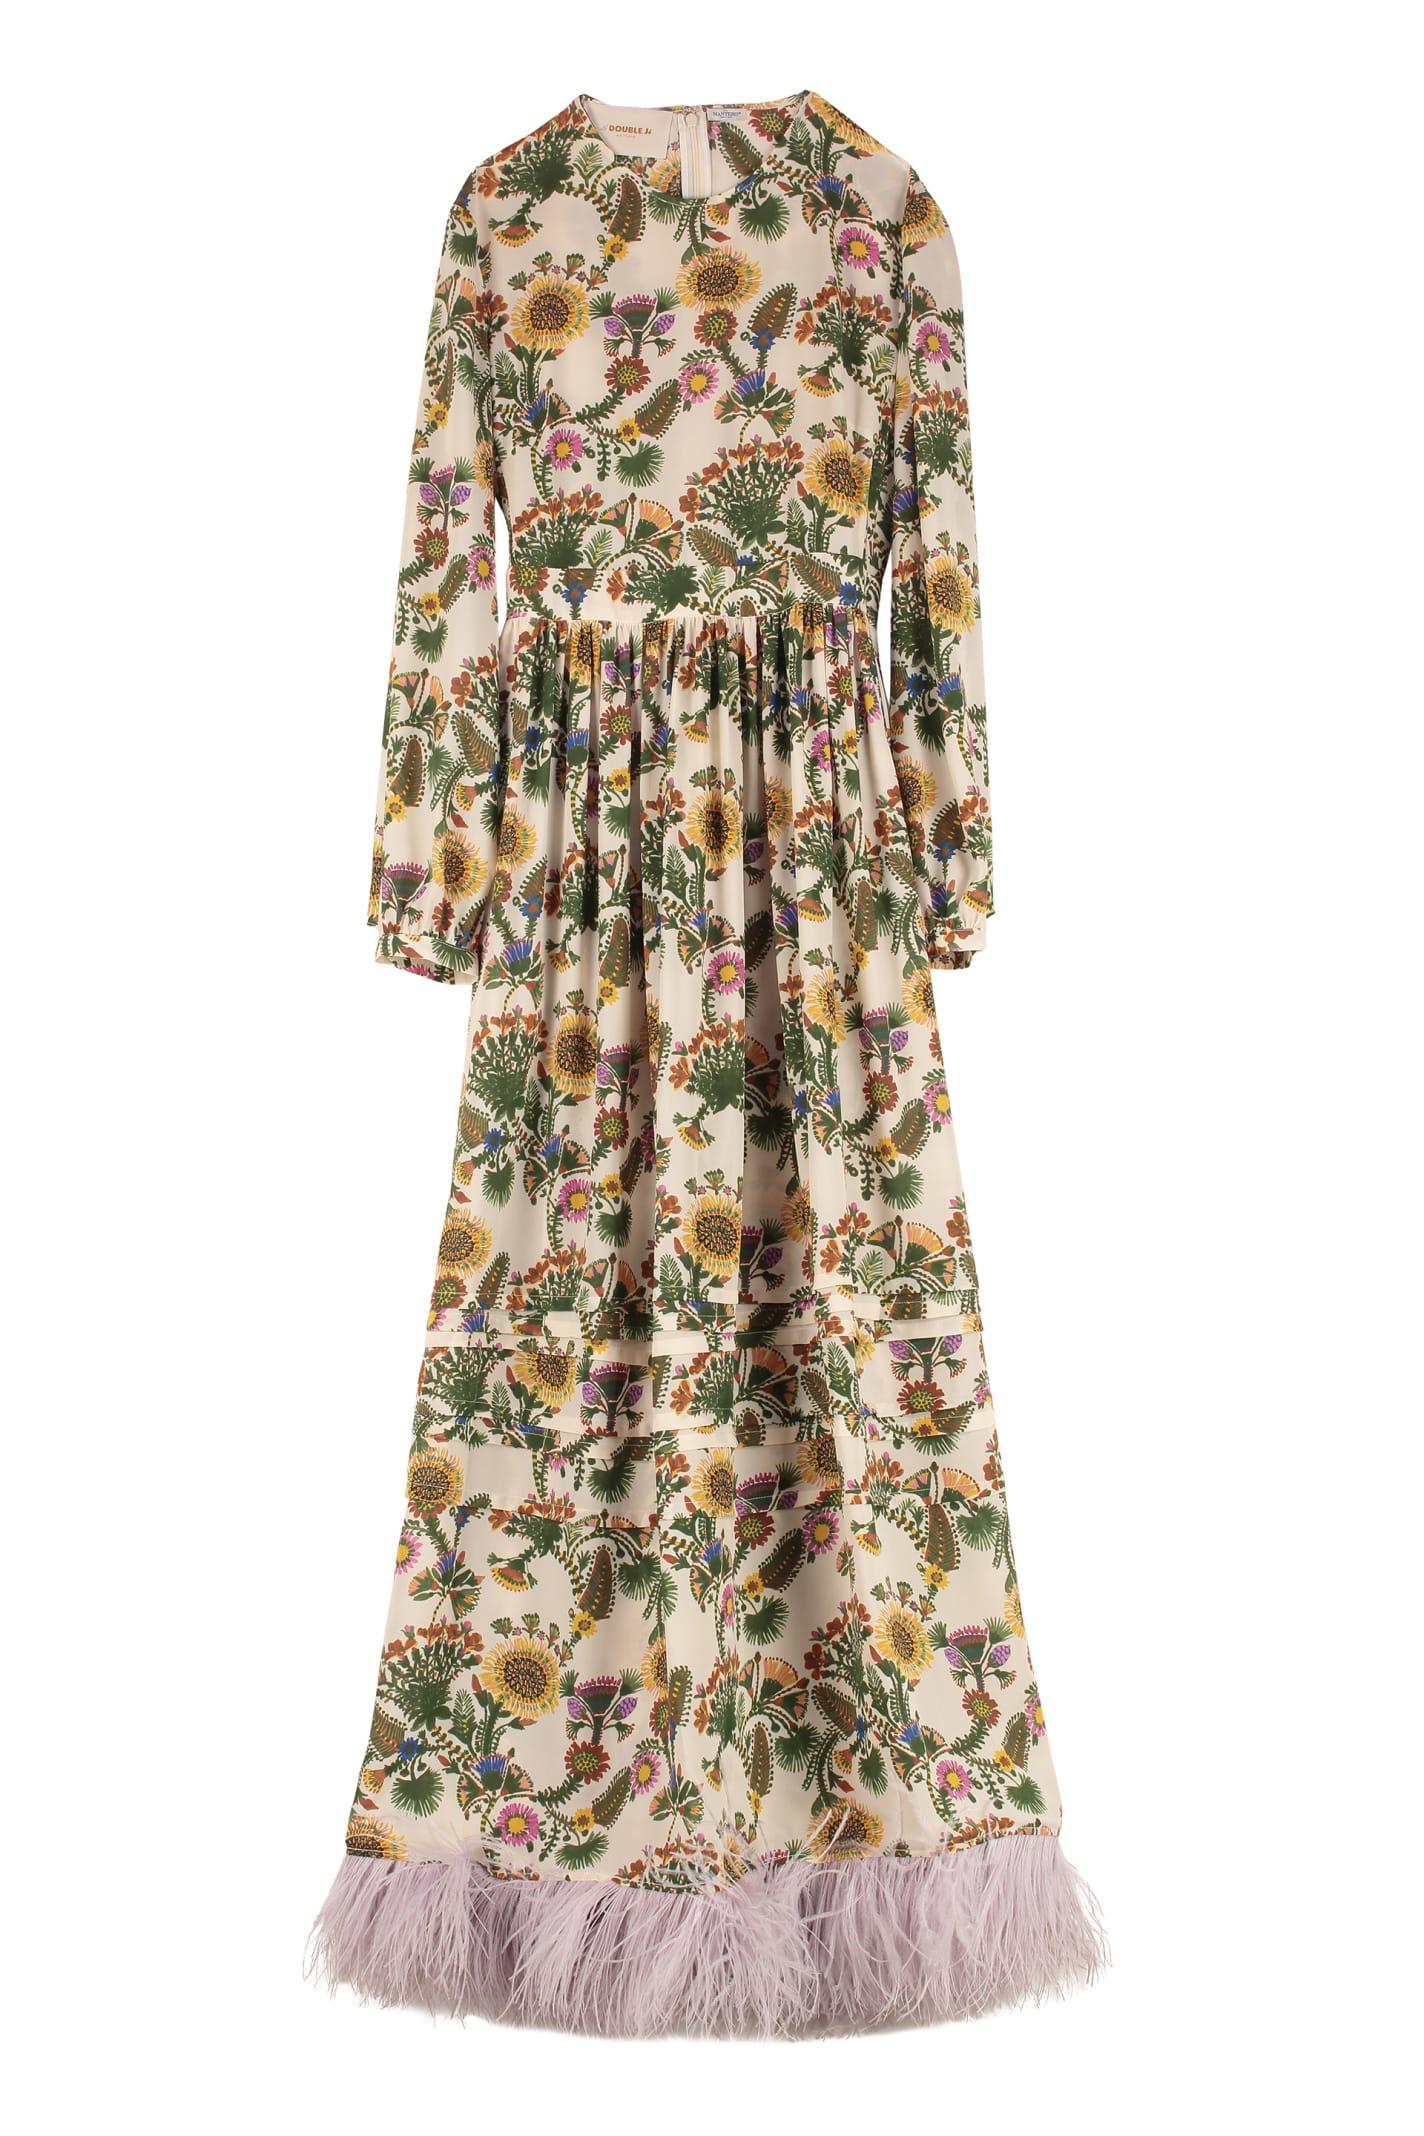 Buy La DoubleJ Pemberley Floral Print Maxi Dress online, shop La DoubleJ with free shipping